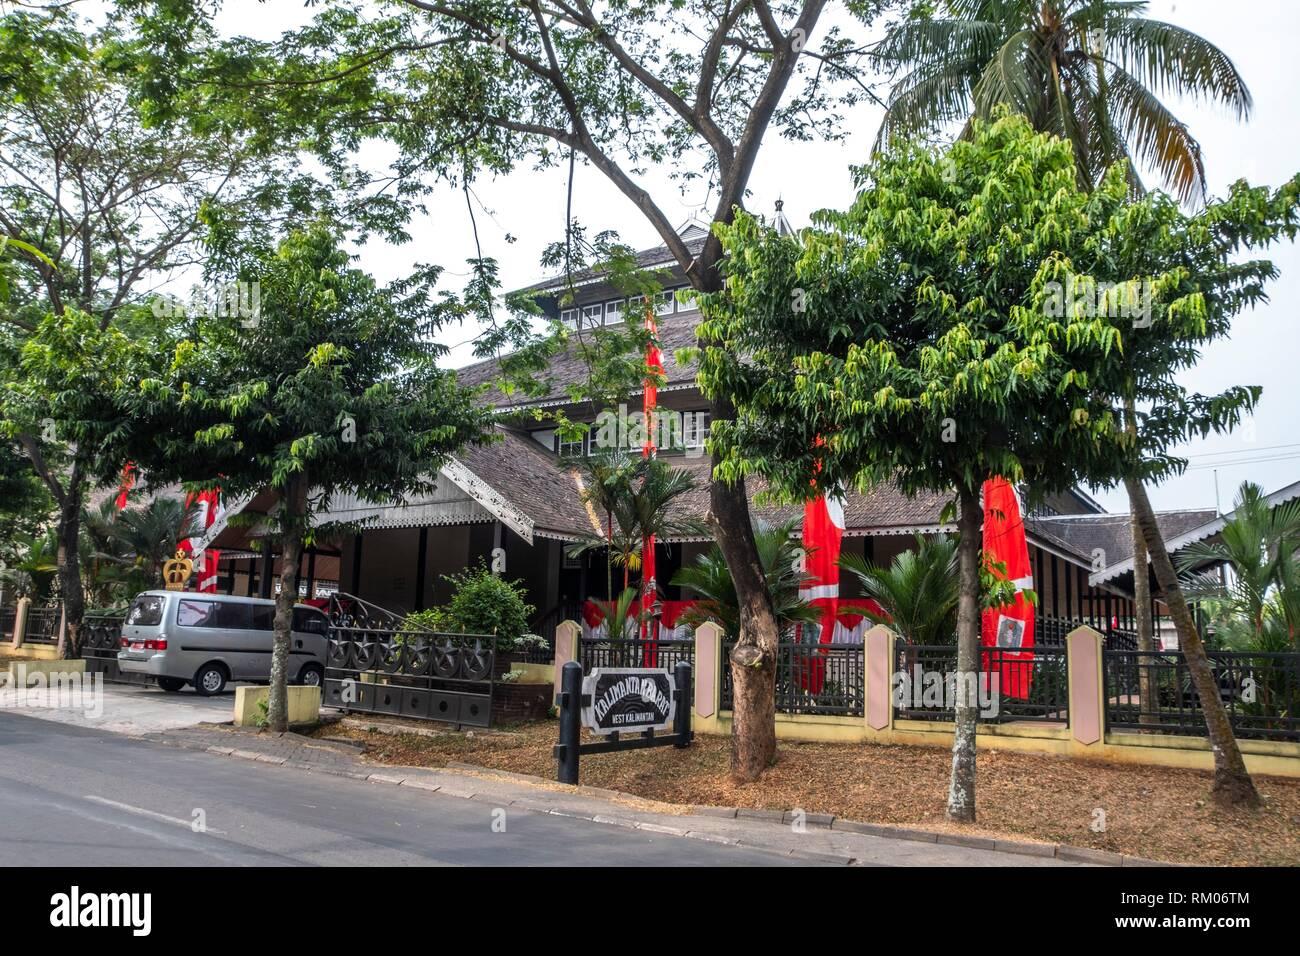 Kalimantan house in Taman Mini Indonesia Indah Park, Jakarta - Stock Image